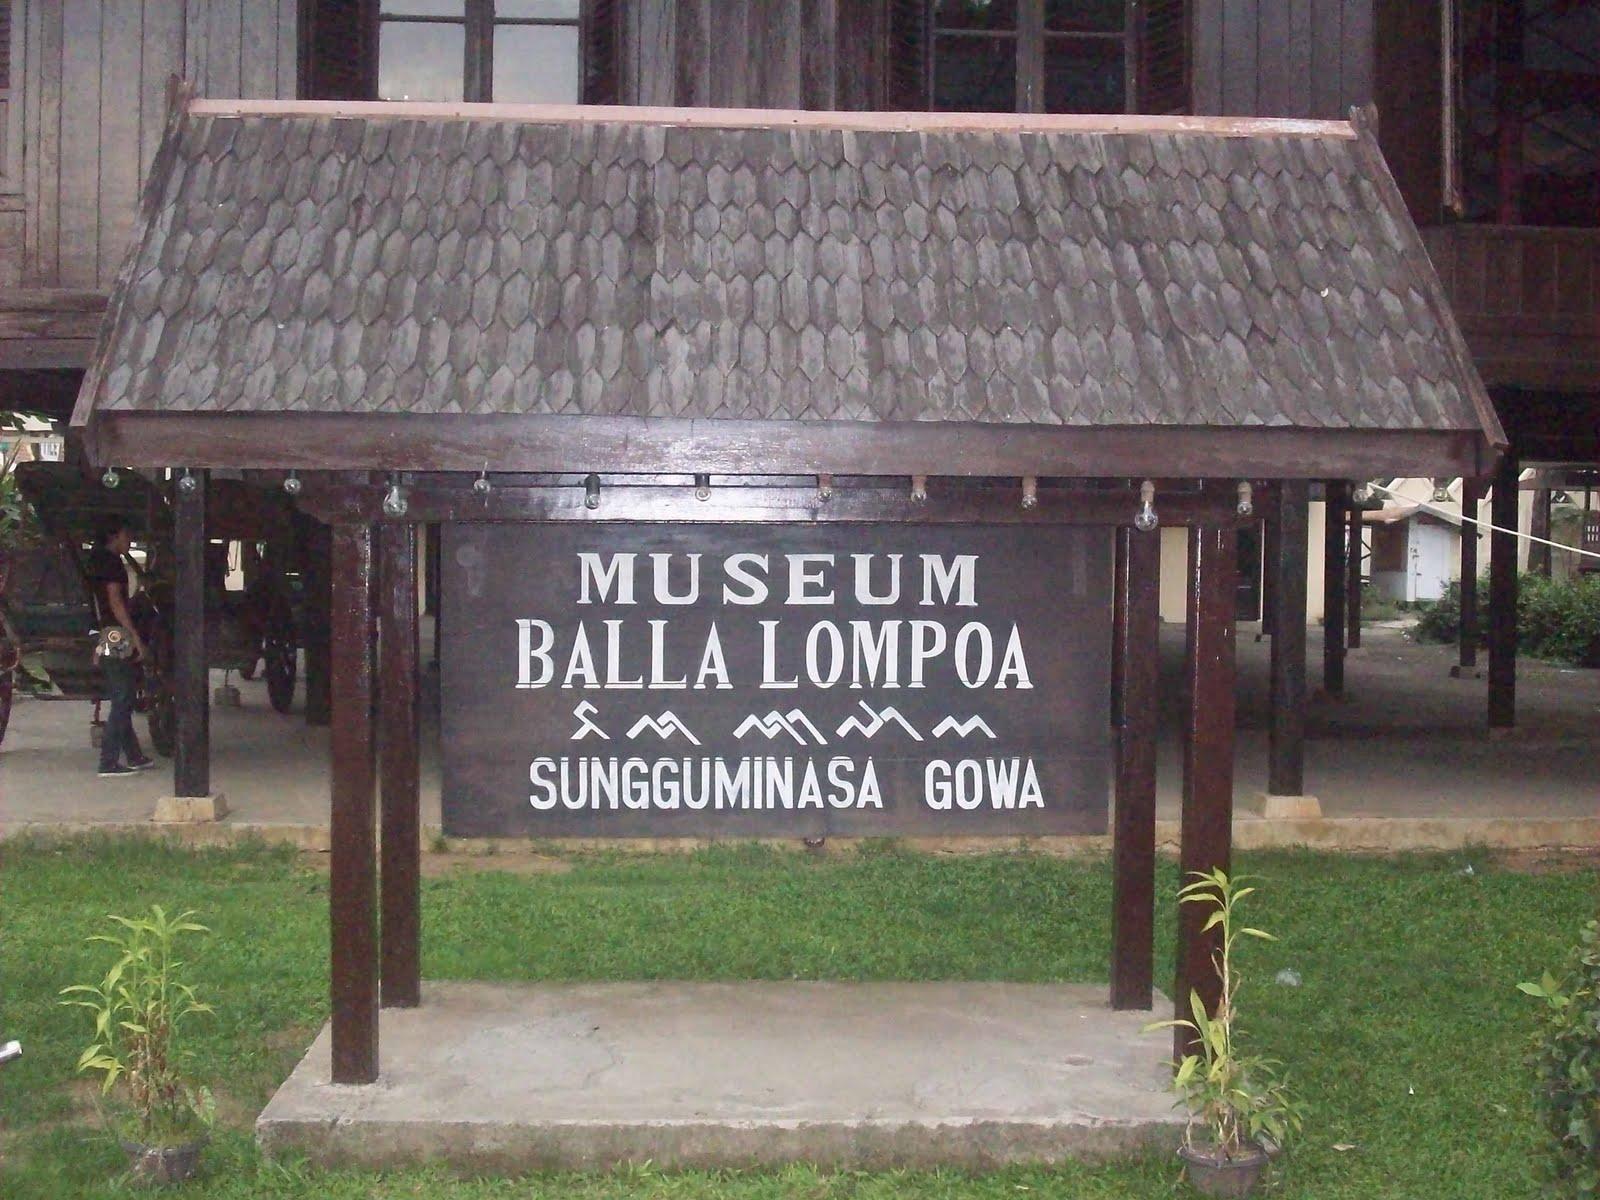 Arung Pallaka Wisata Tour Travel Museum Balla Lompoa Sungguminasa Rekonstruksi